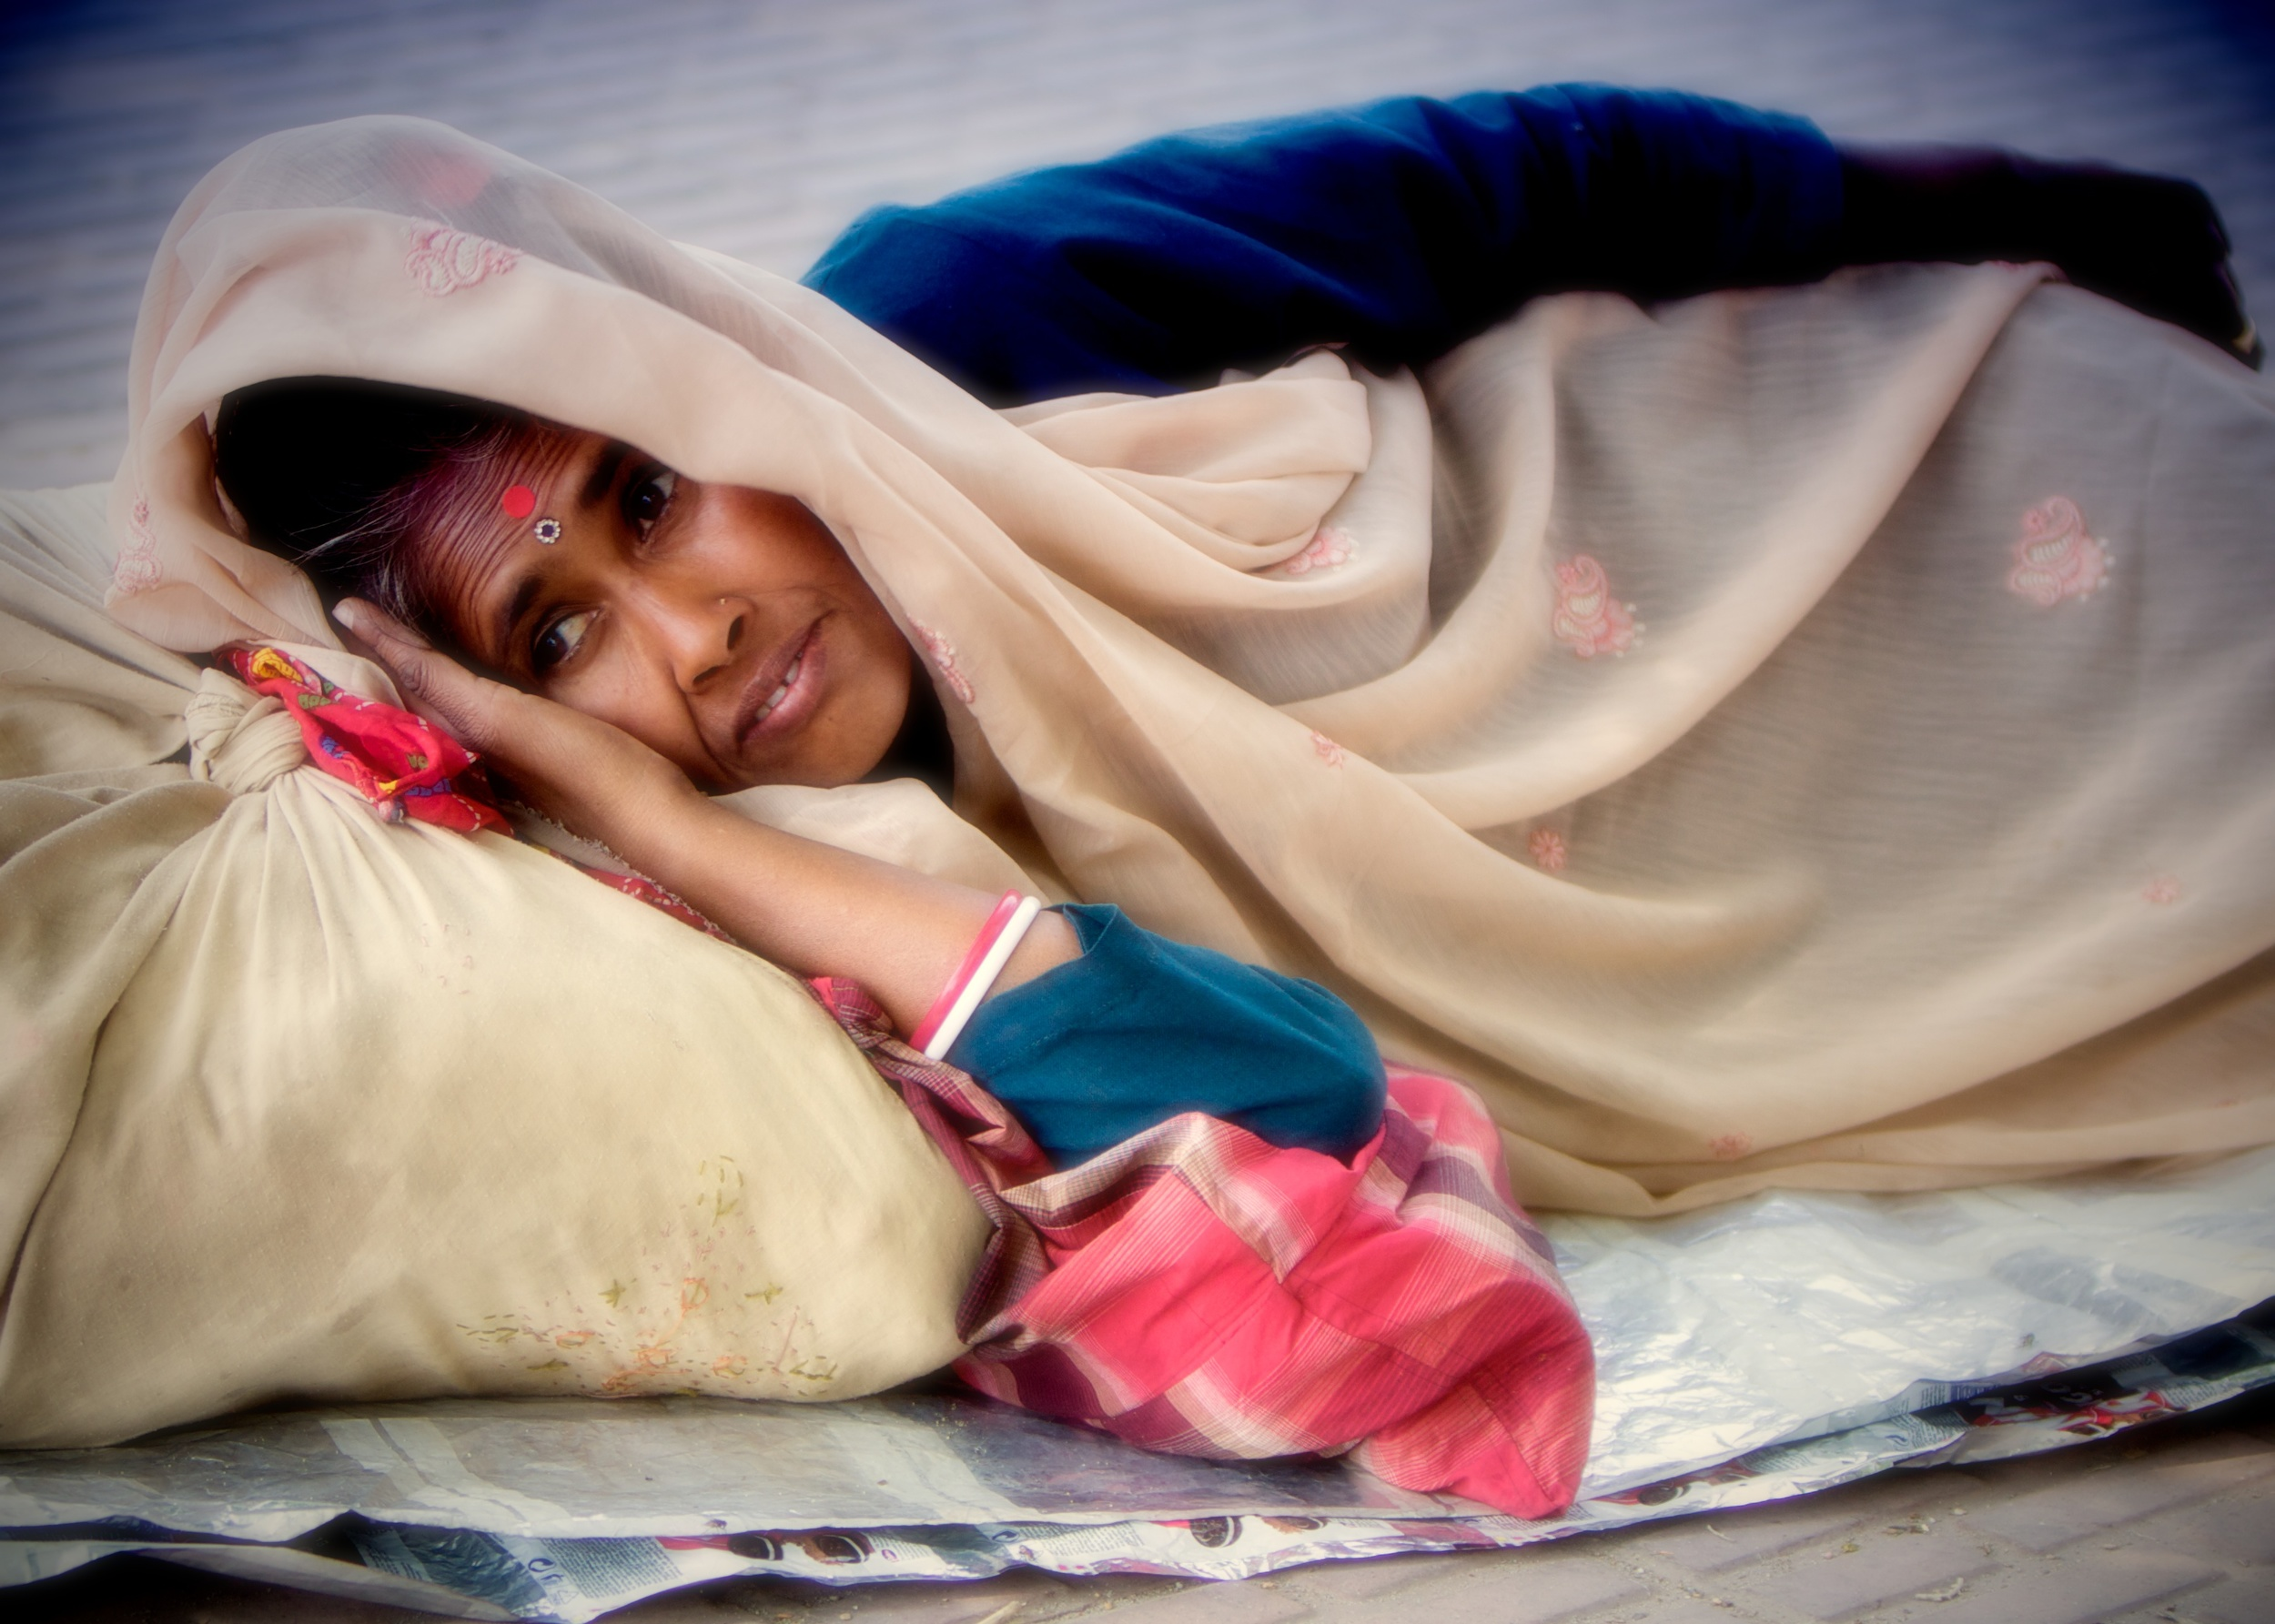 pilgram woman at rest.jpg